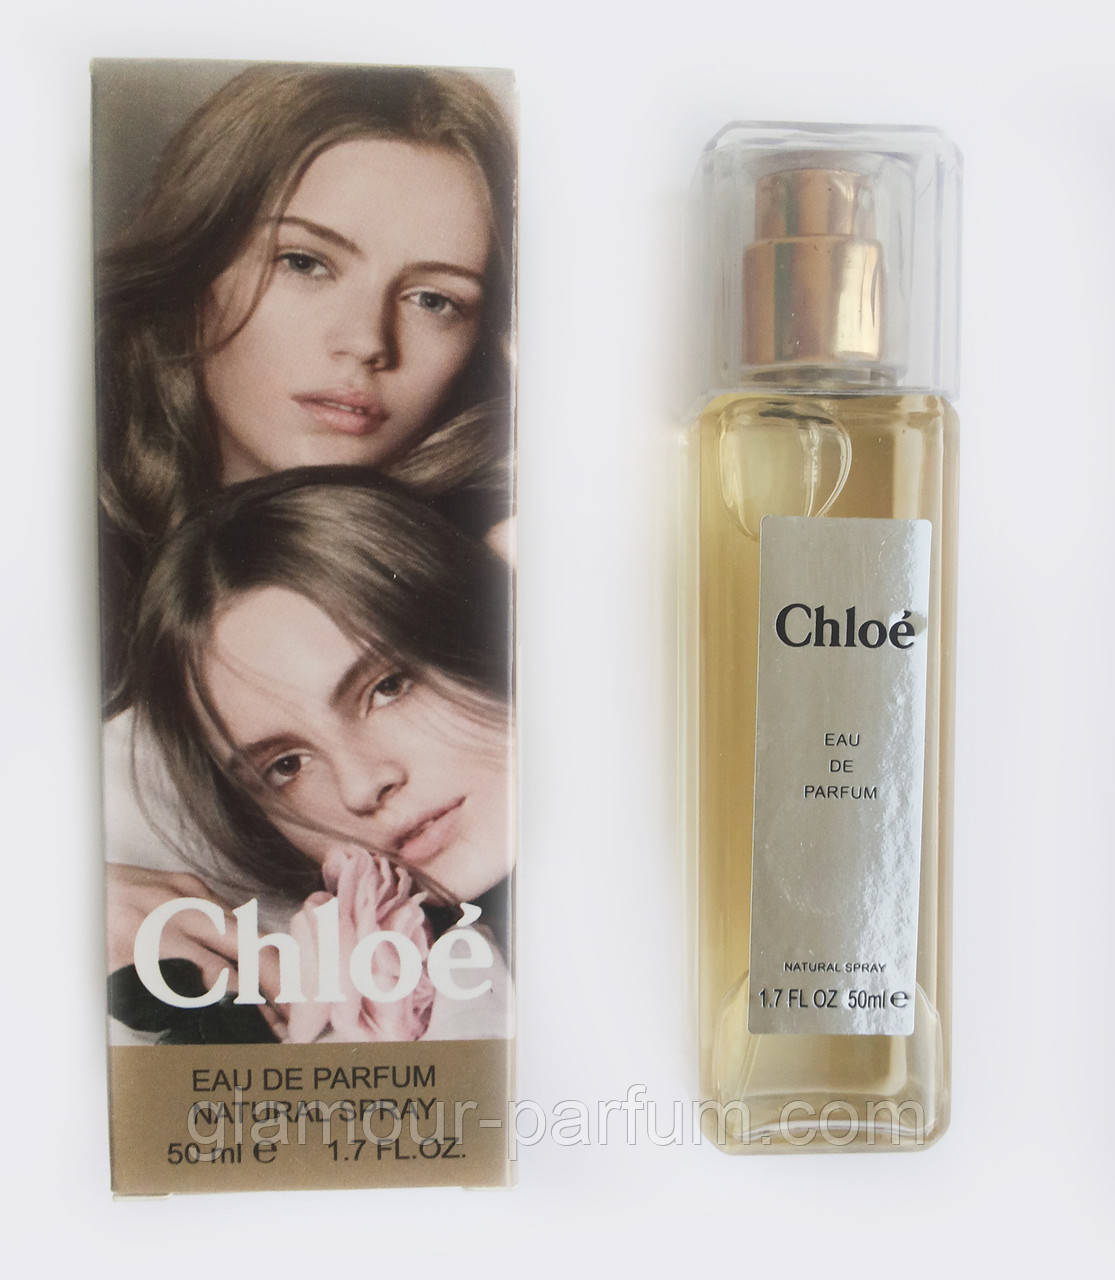 Мини-парфюм Chloe Eau De Parfum (Хлое О Де Парфюм) 50 мл.